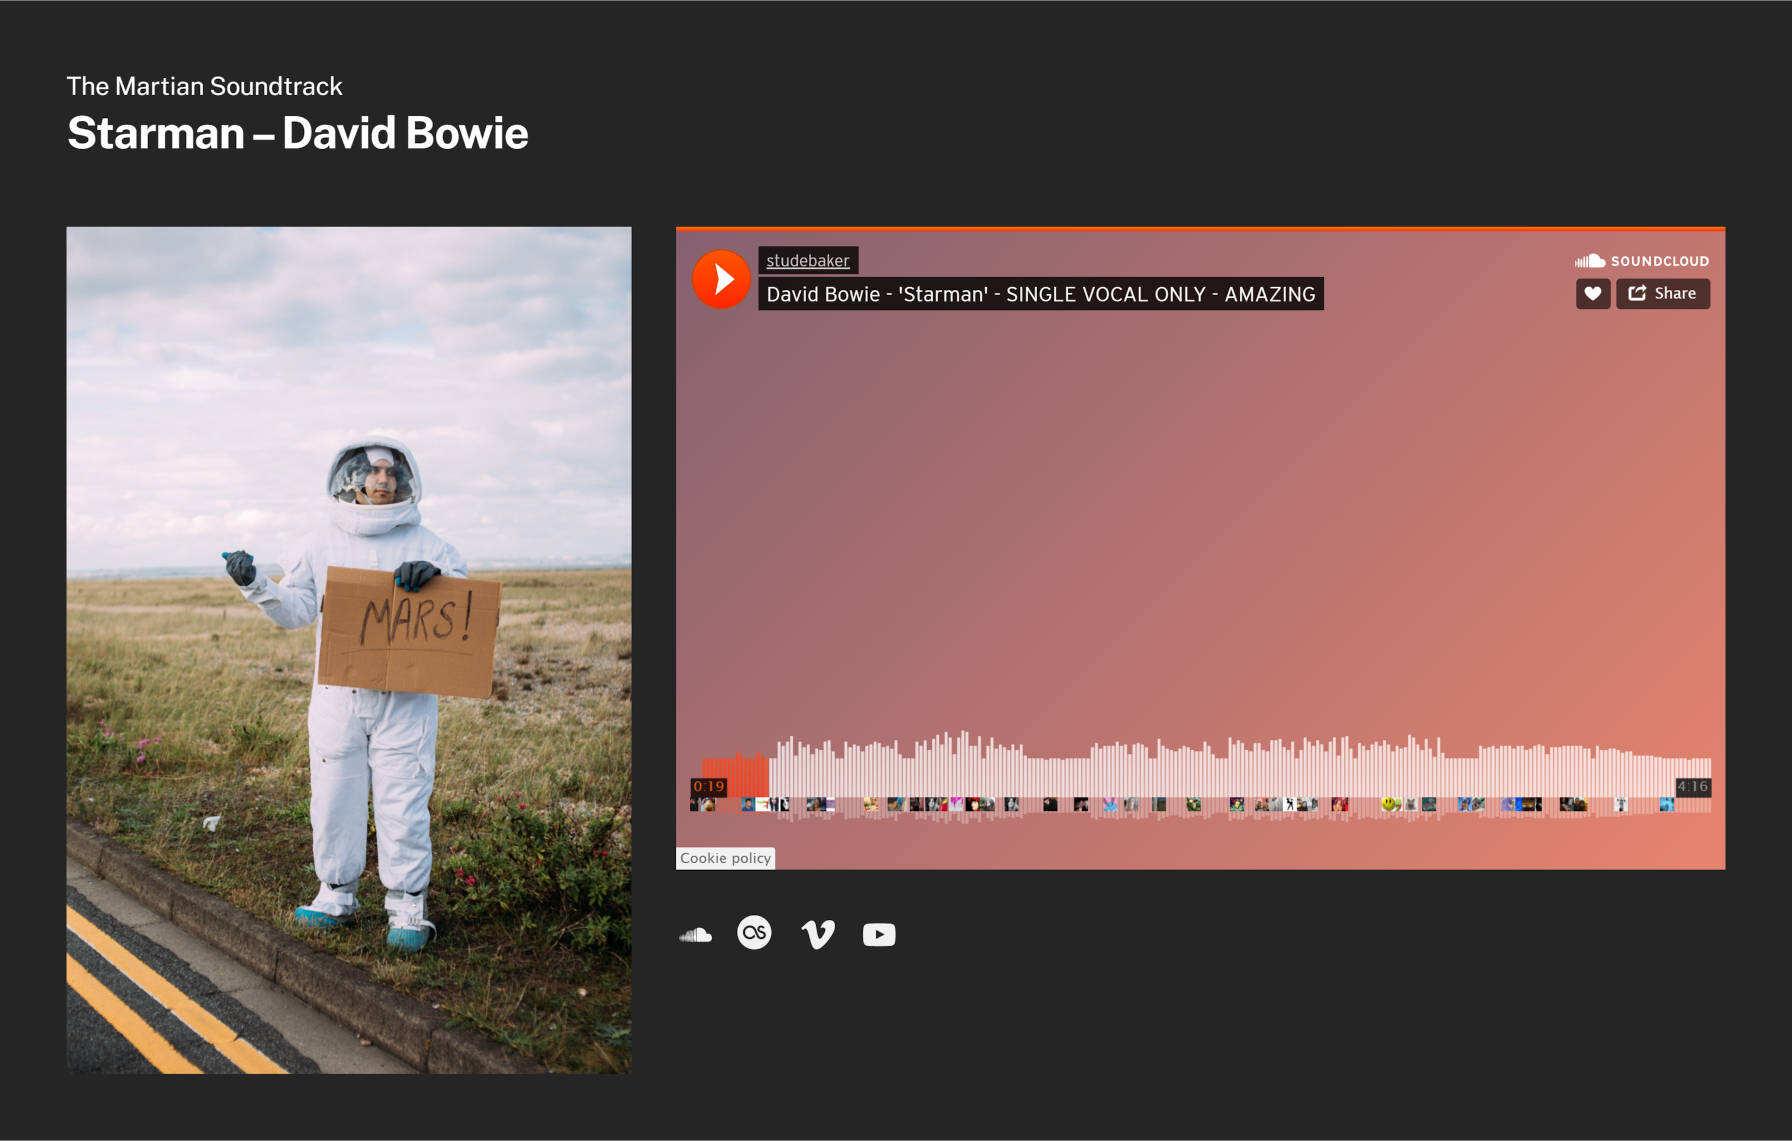 soundcloud音频播放区块模式